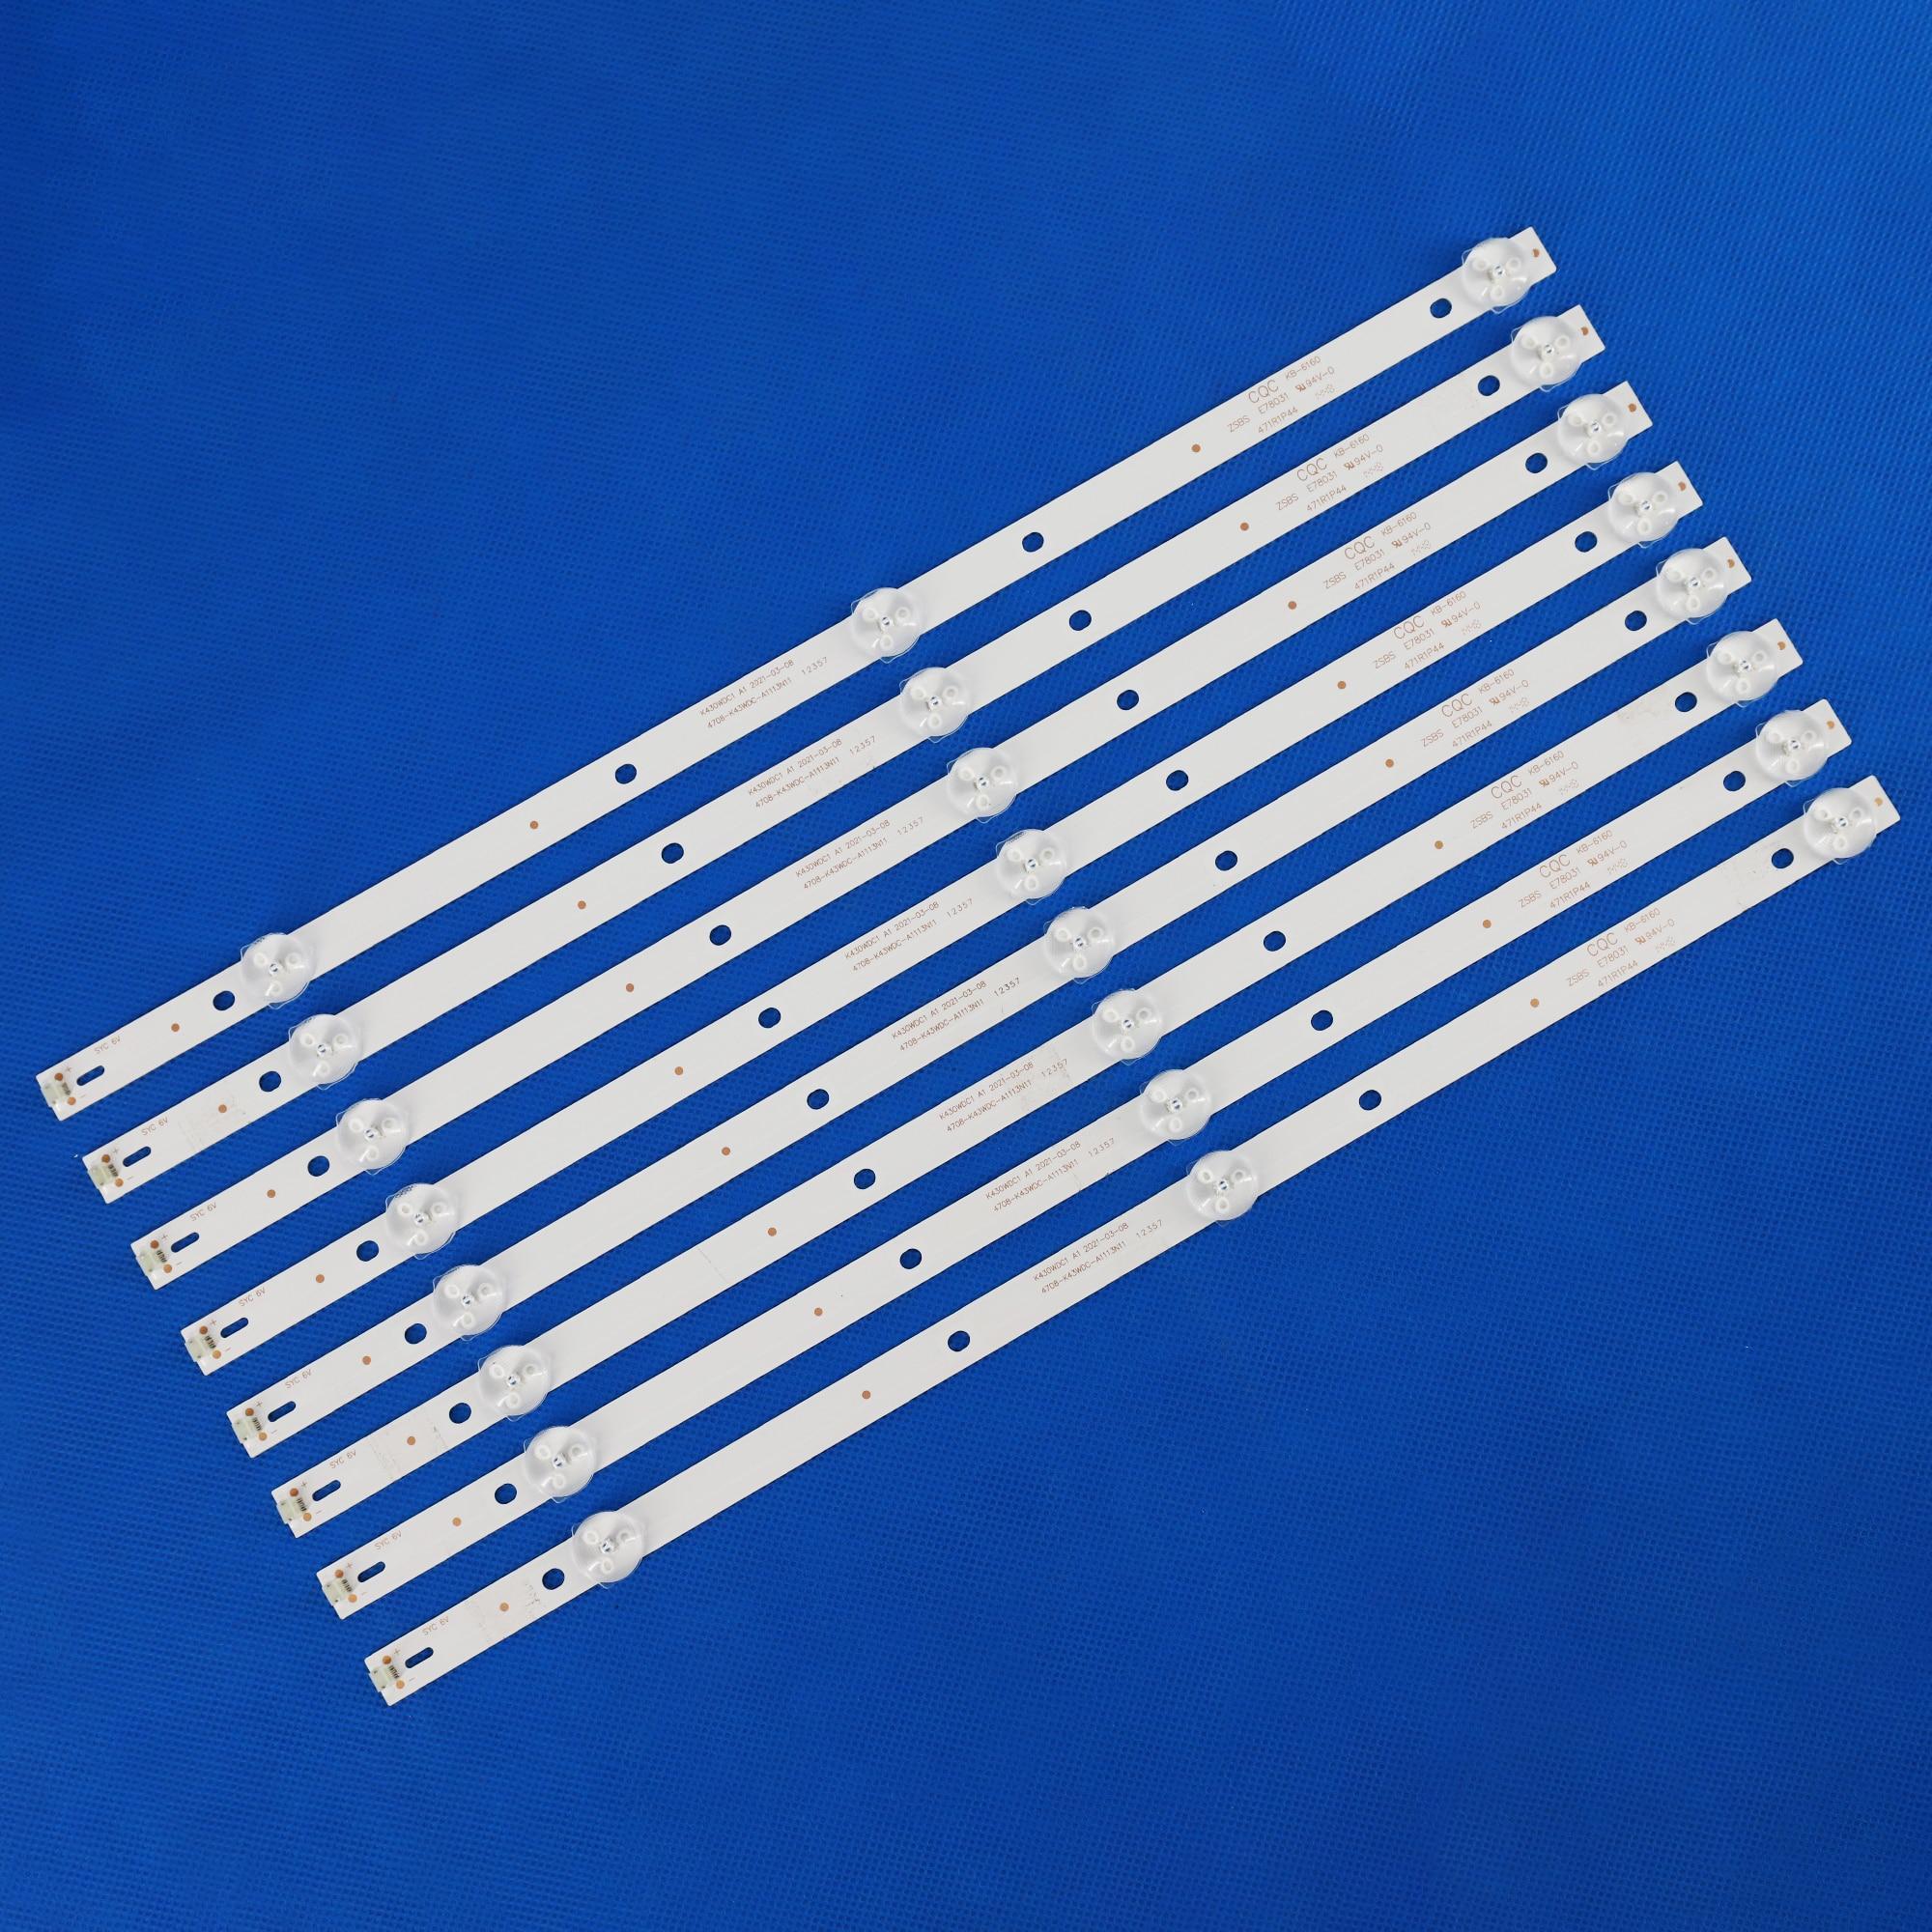 40 PCS LED  strip for Philips 43DL4012N/62 43HFF5952 43BDL4012N/62 43PFT4002 L43E6800 43L1600C K430WD9 K430WDK3 K430WDC1